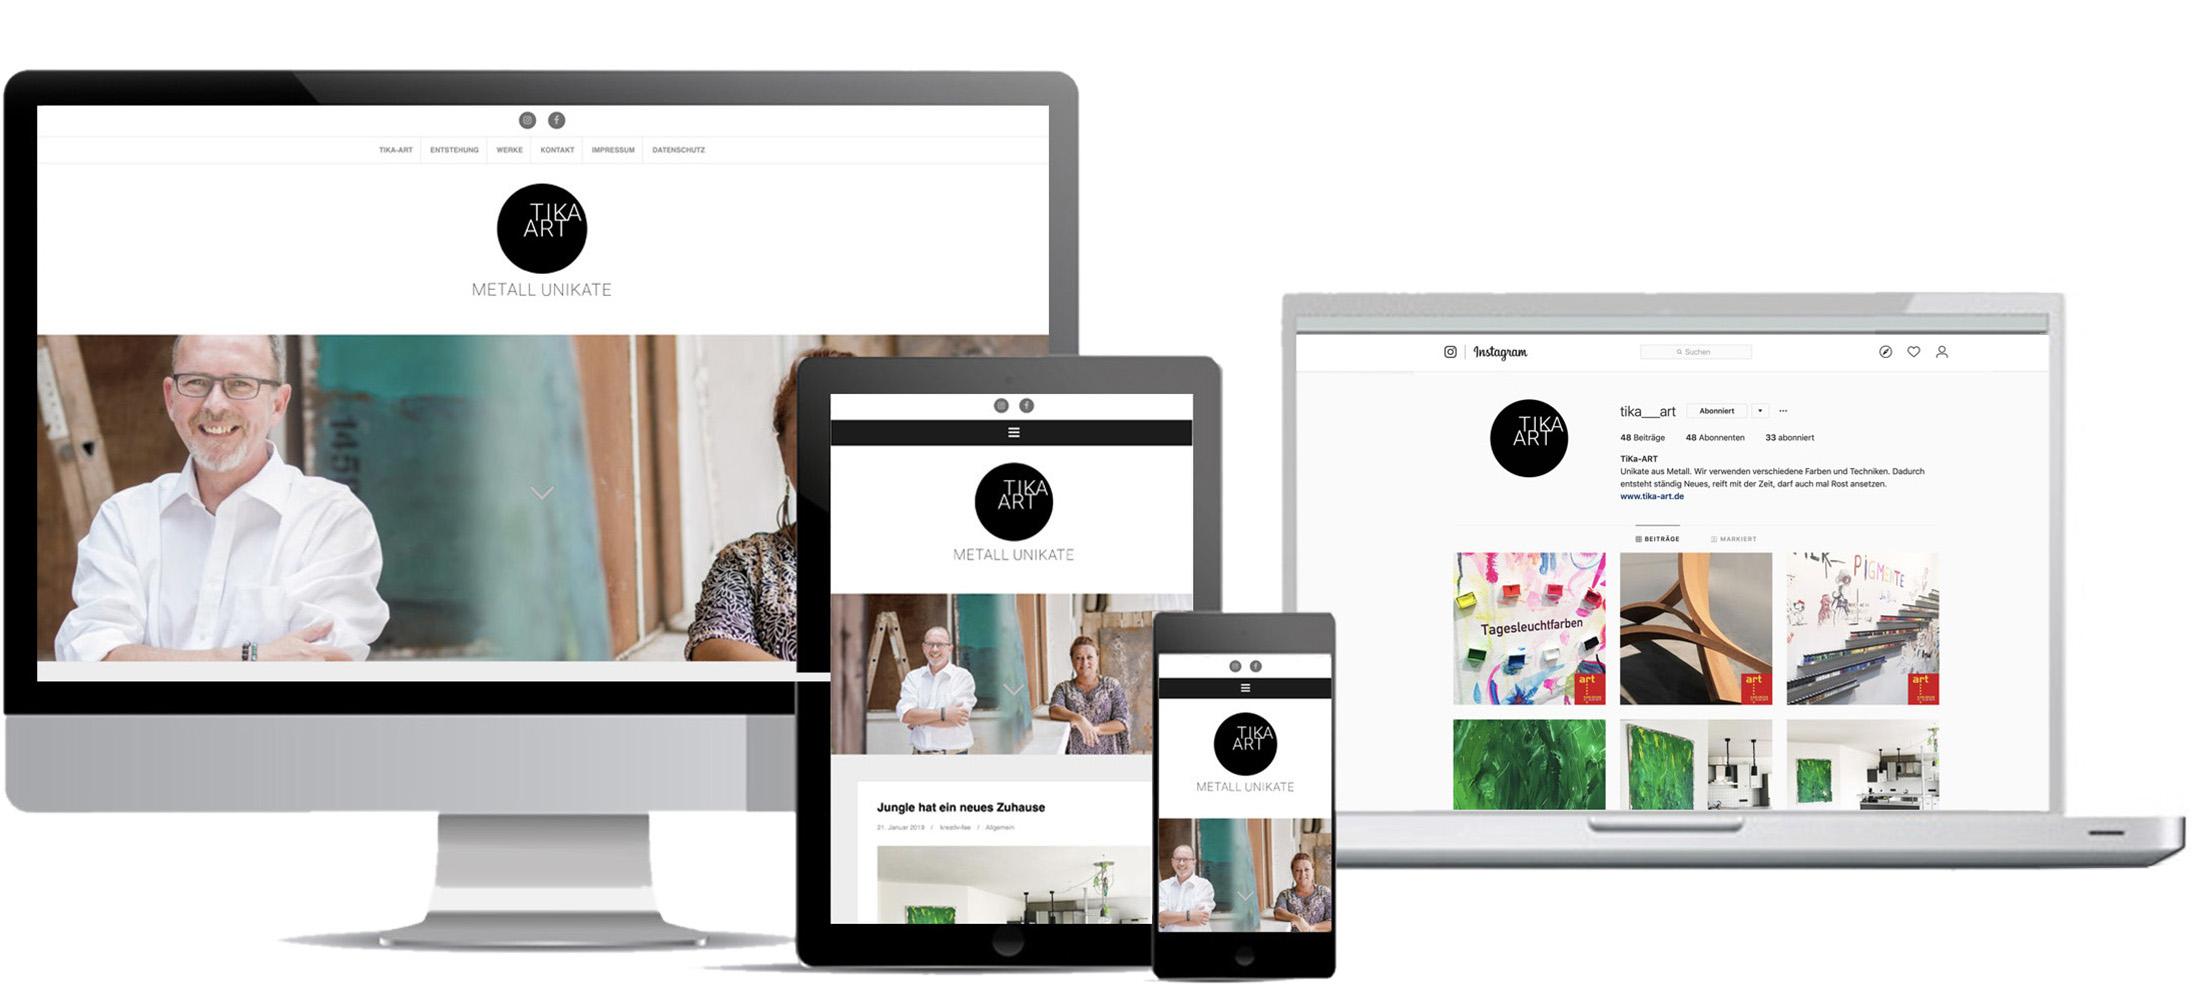 Kreativ-Fee_Kommunikationsdesign_Websites-Bild-TiKa-ART-Instagram_NEU